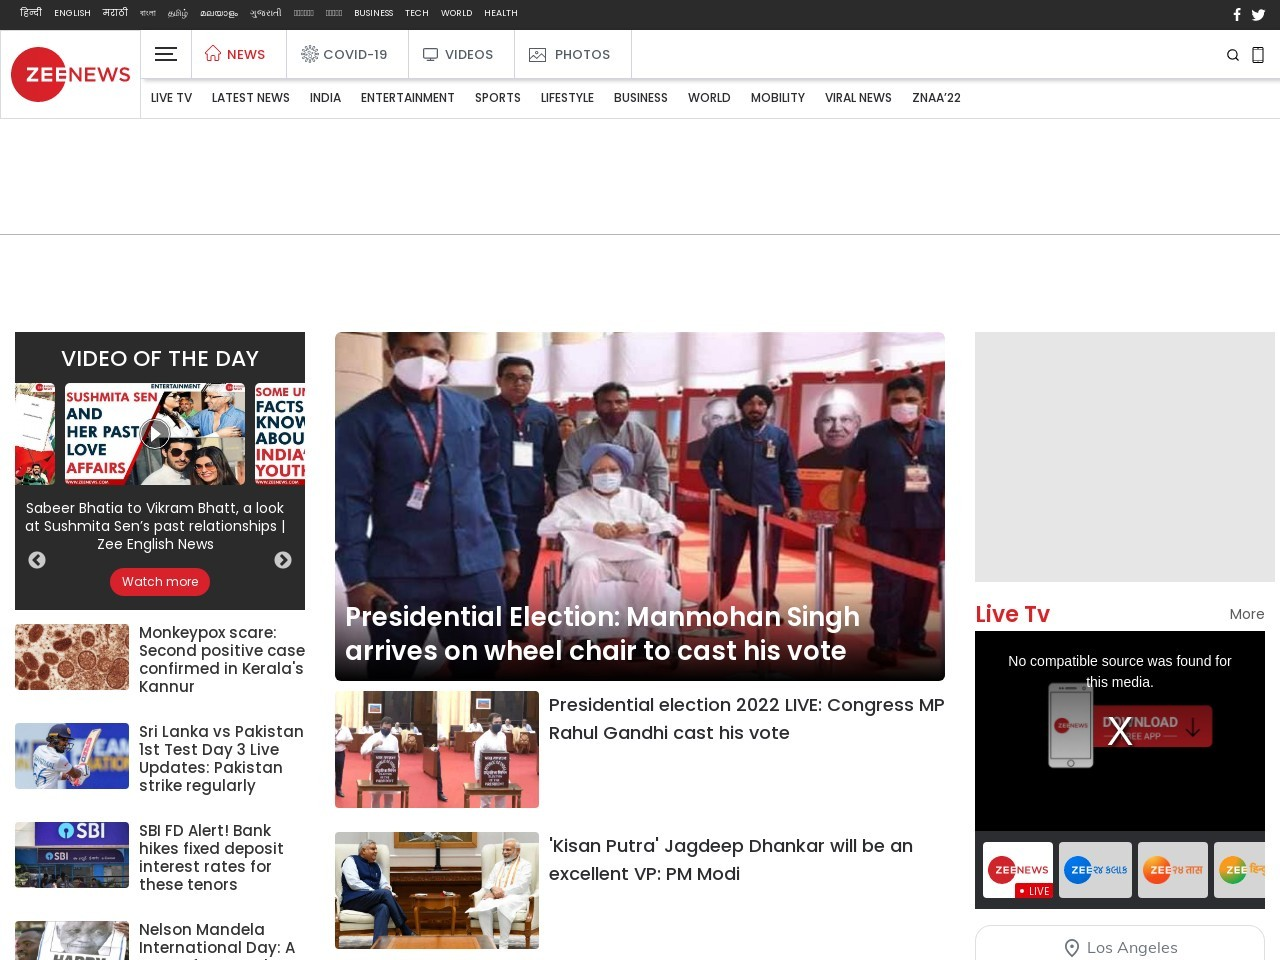 Fodder Scam: Lalu Prasad Yadav, JD(U) MP Jagdish Sharma Disqualified From Lok Sabha